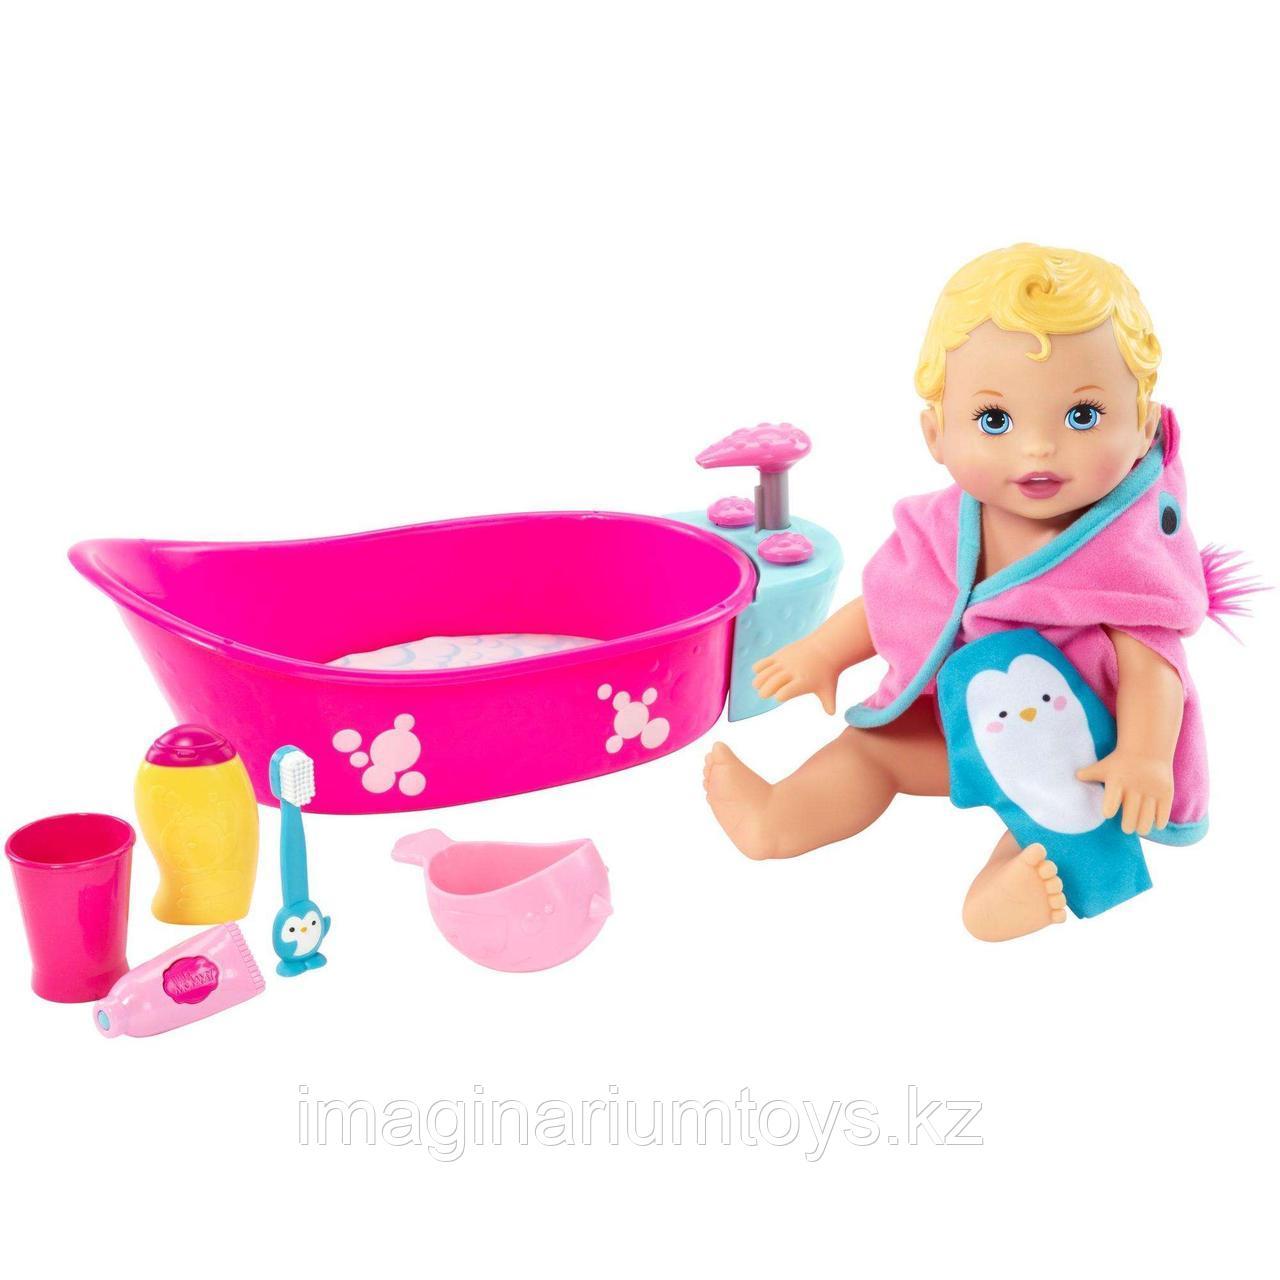 Кукла с ванной делюкс Little Mommy Bubbly Bathtime